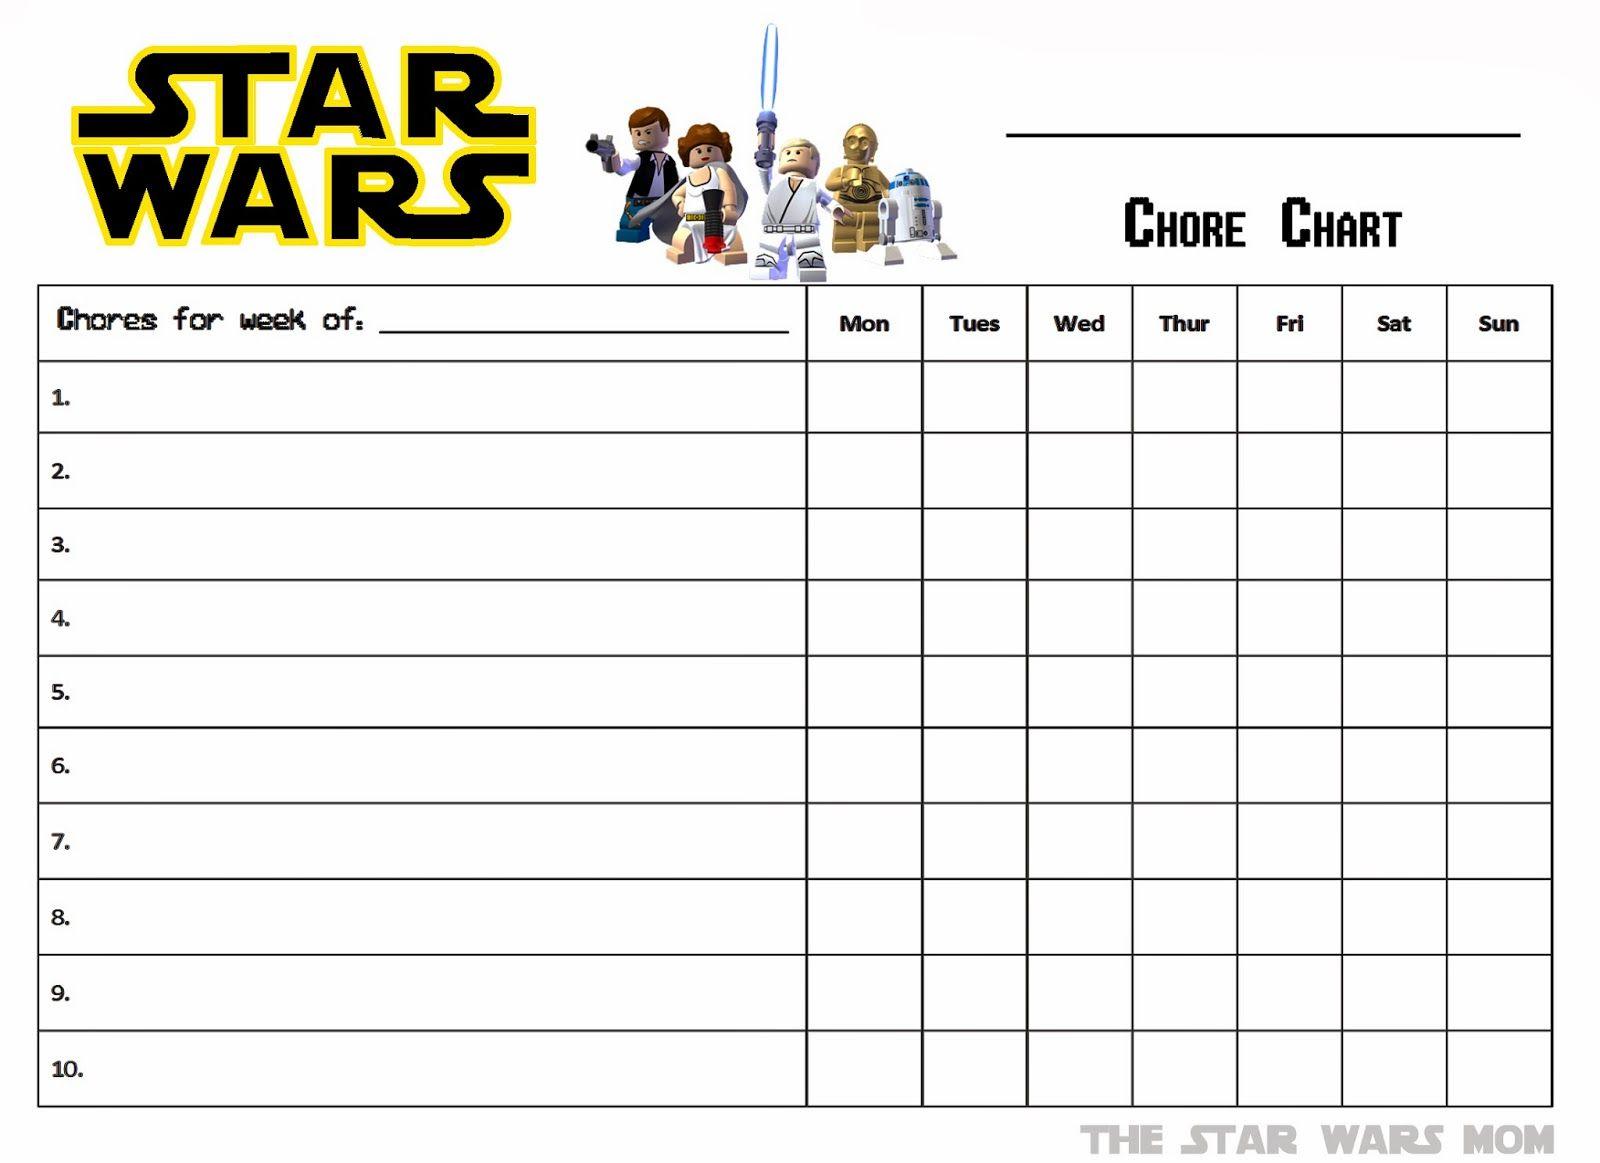 Star Wars Free Printable Chore Chart